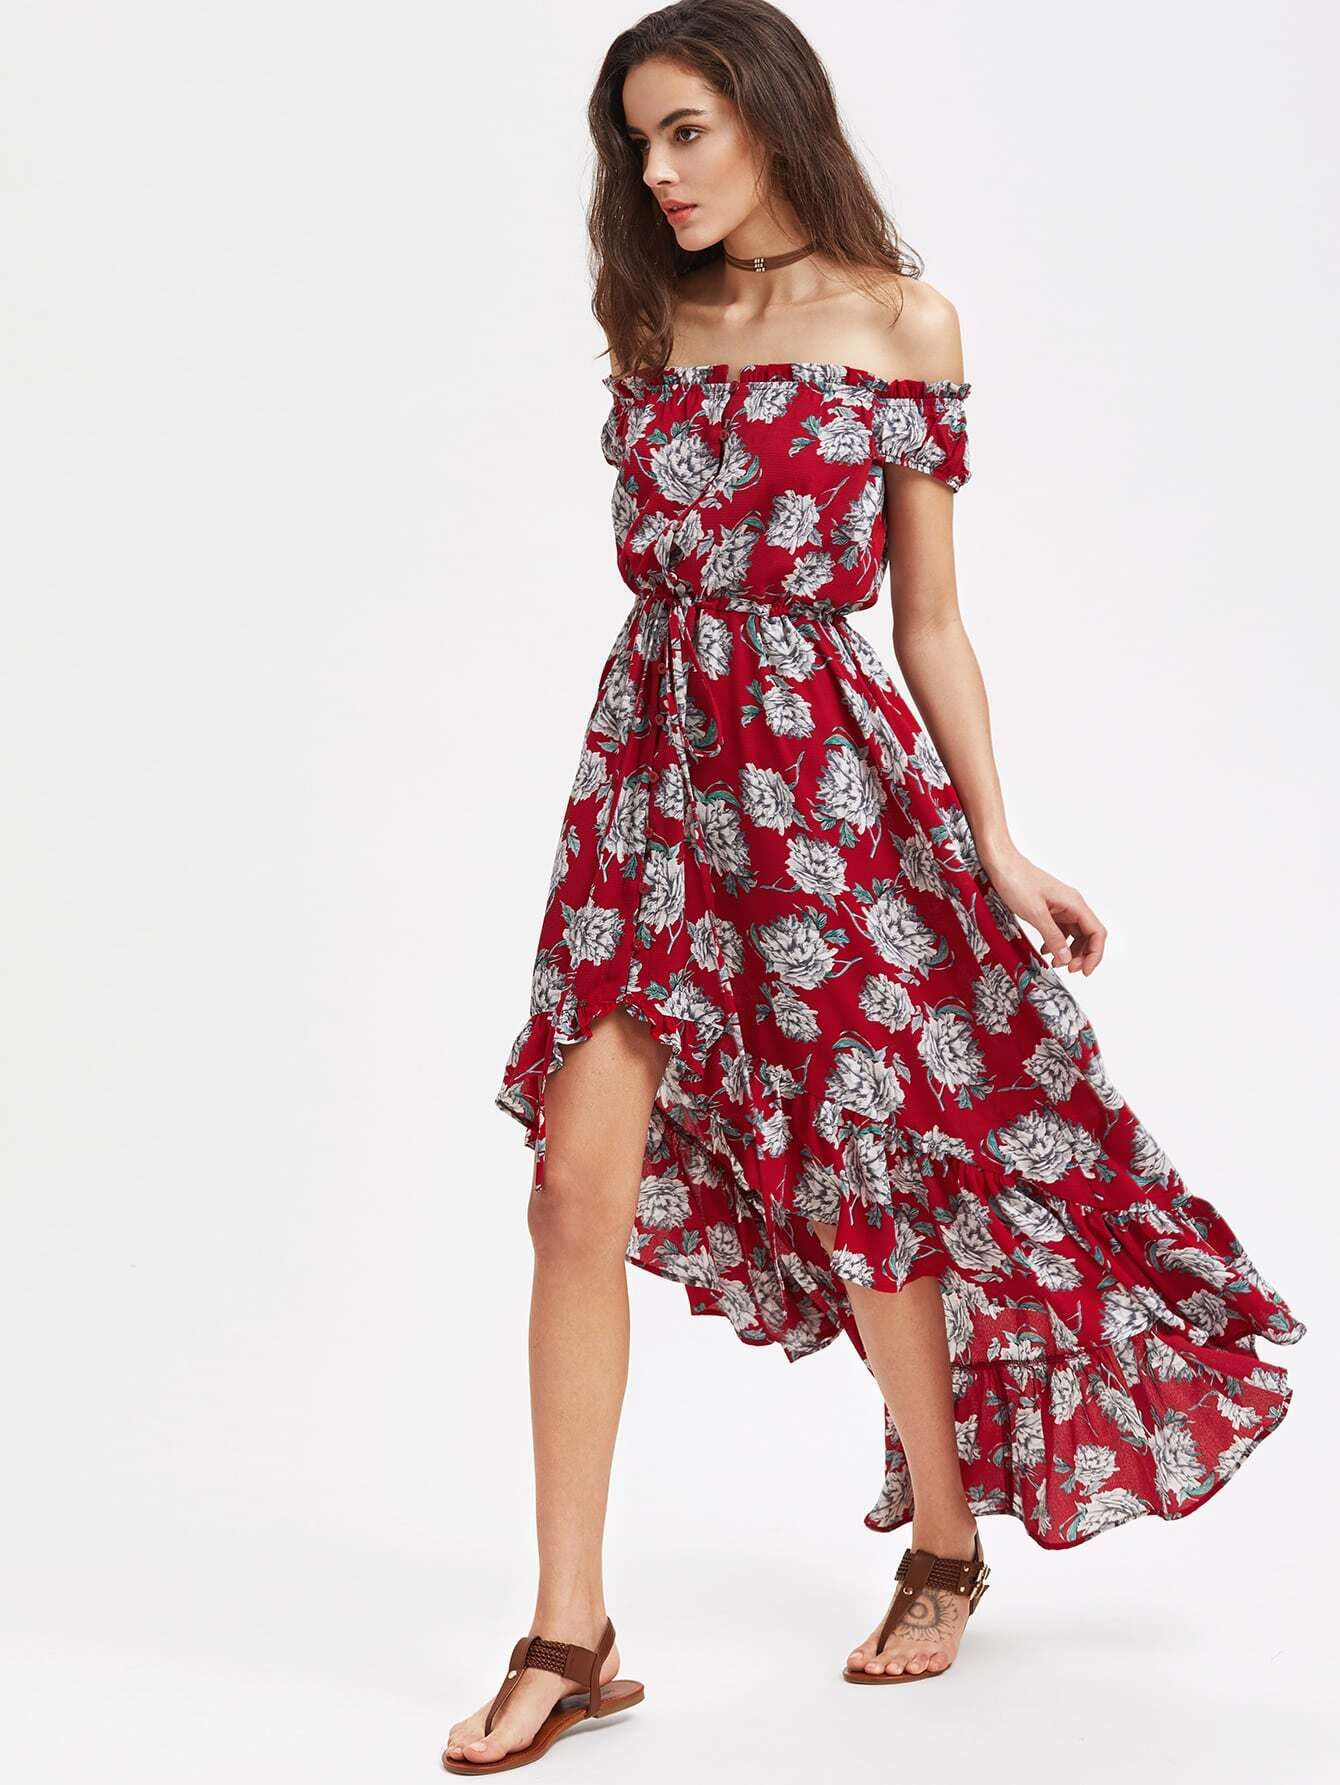 Фото Flower Print Button Front Drawstring Waist High Low Ruffle Dress. Купить с доставкой